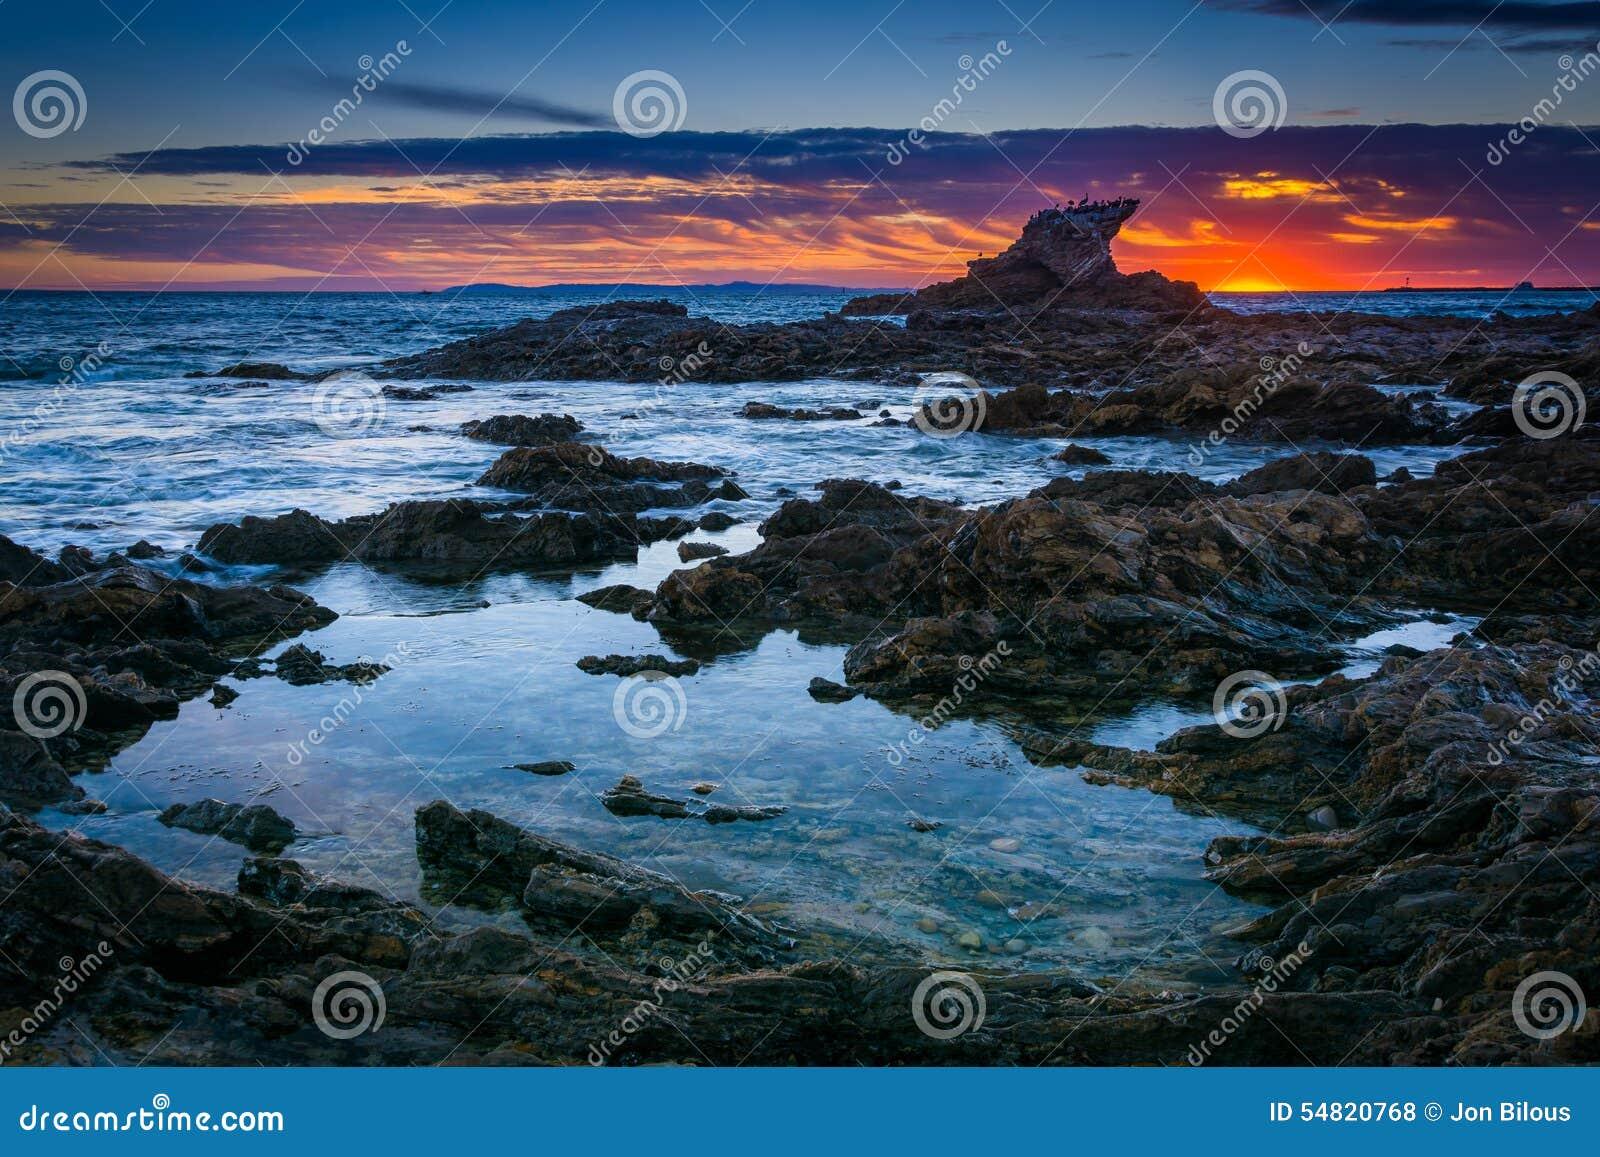 Tide pools at sunset, at Little Corona Beach, in Corona del Mar, California.